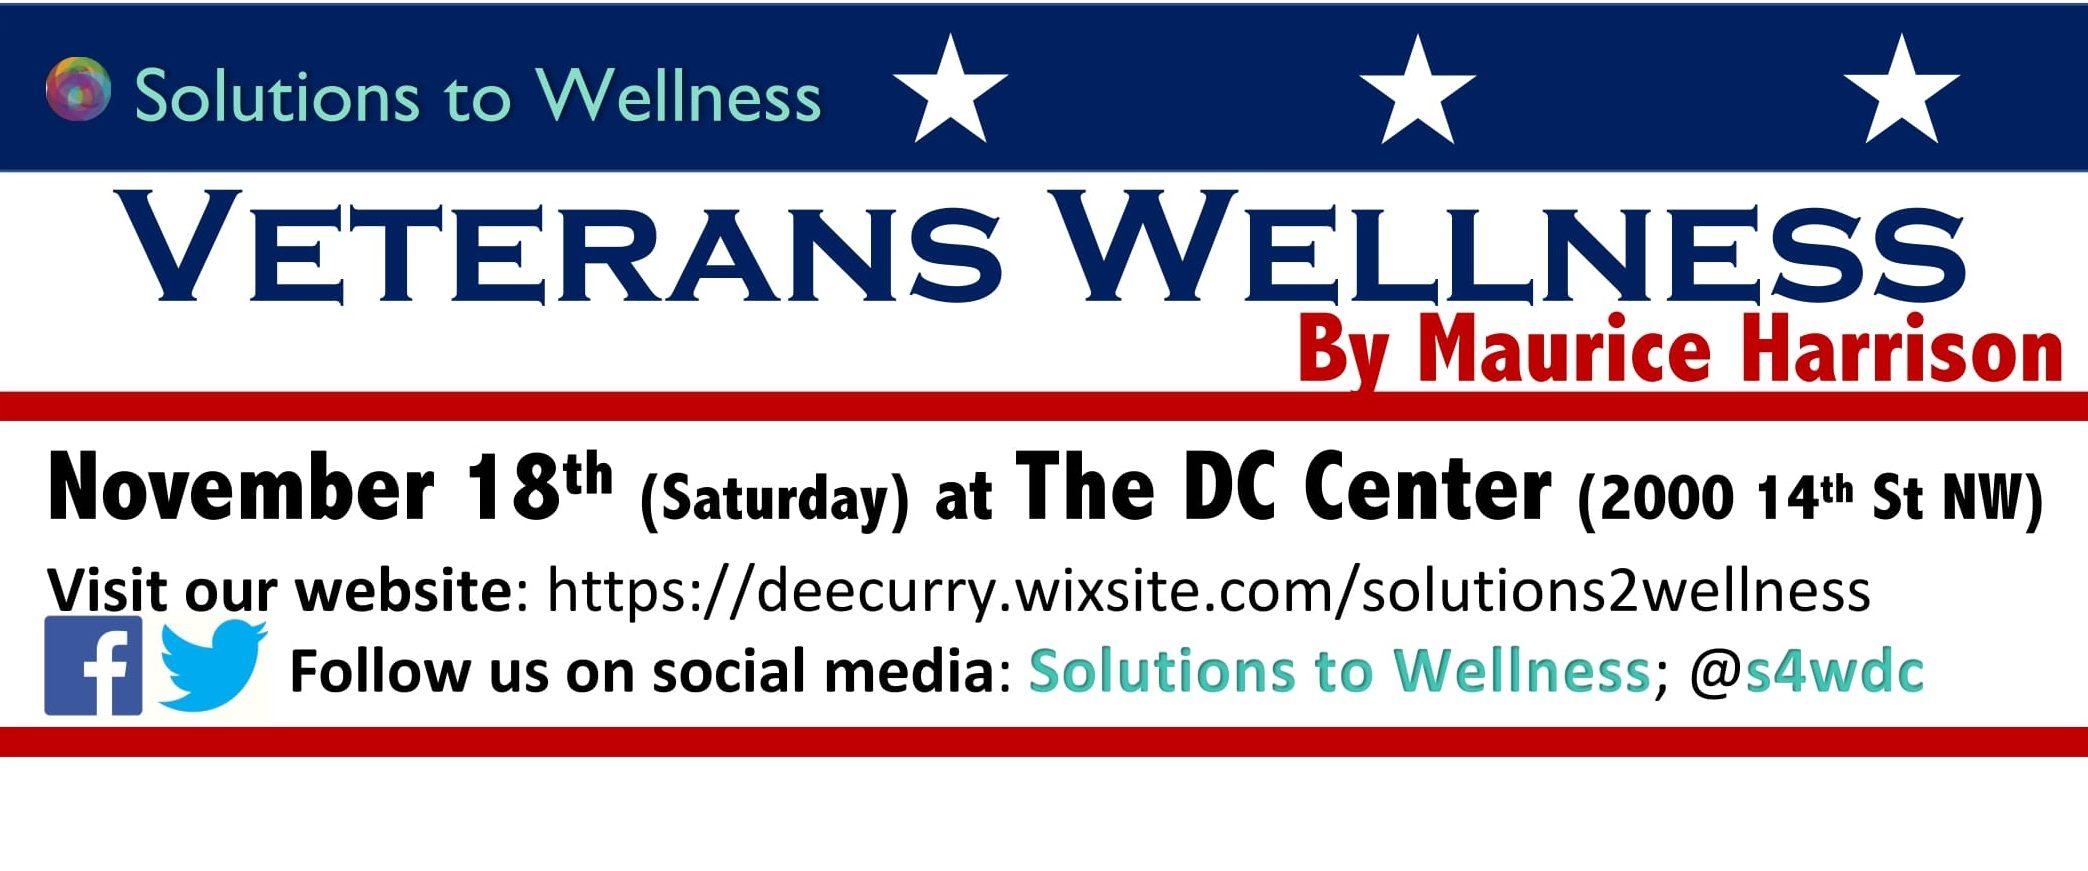 Veterans Affairs & Wellness [Solutions to Wellness 2017]